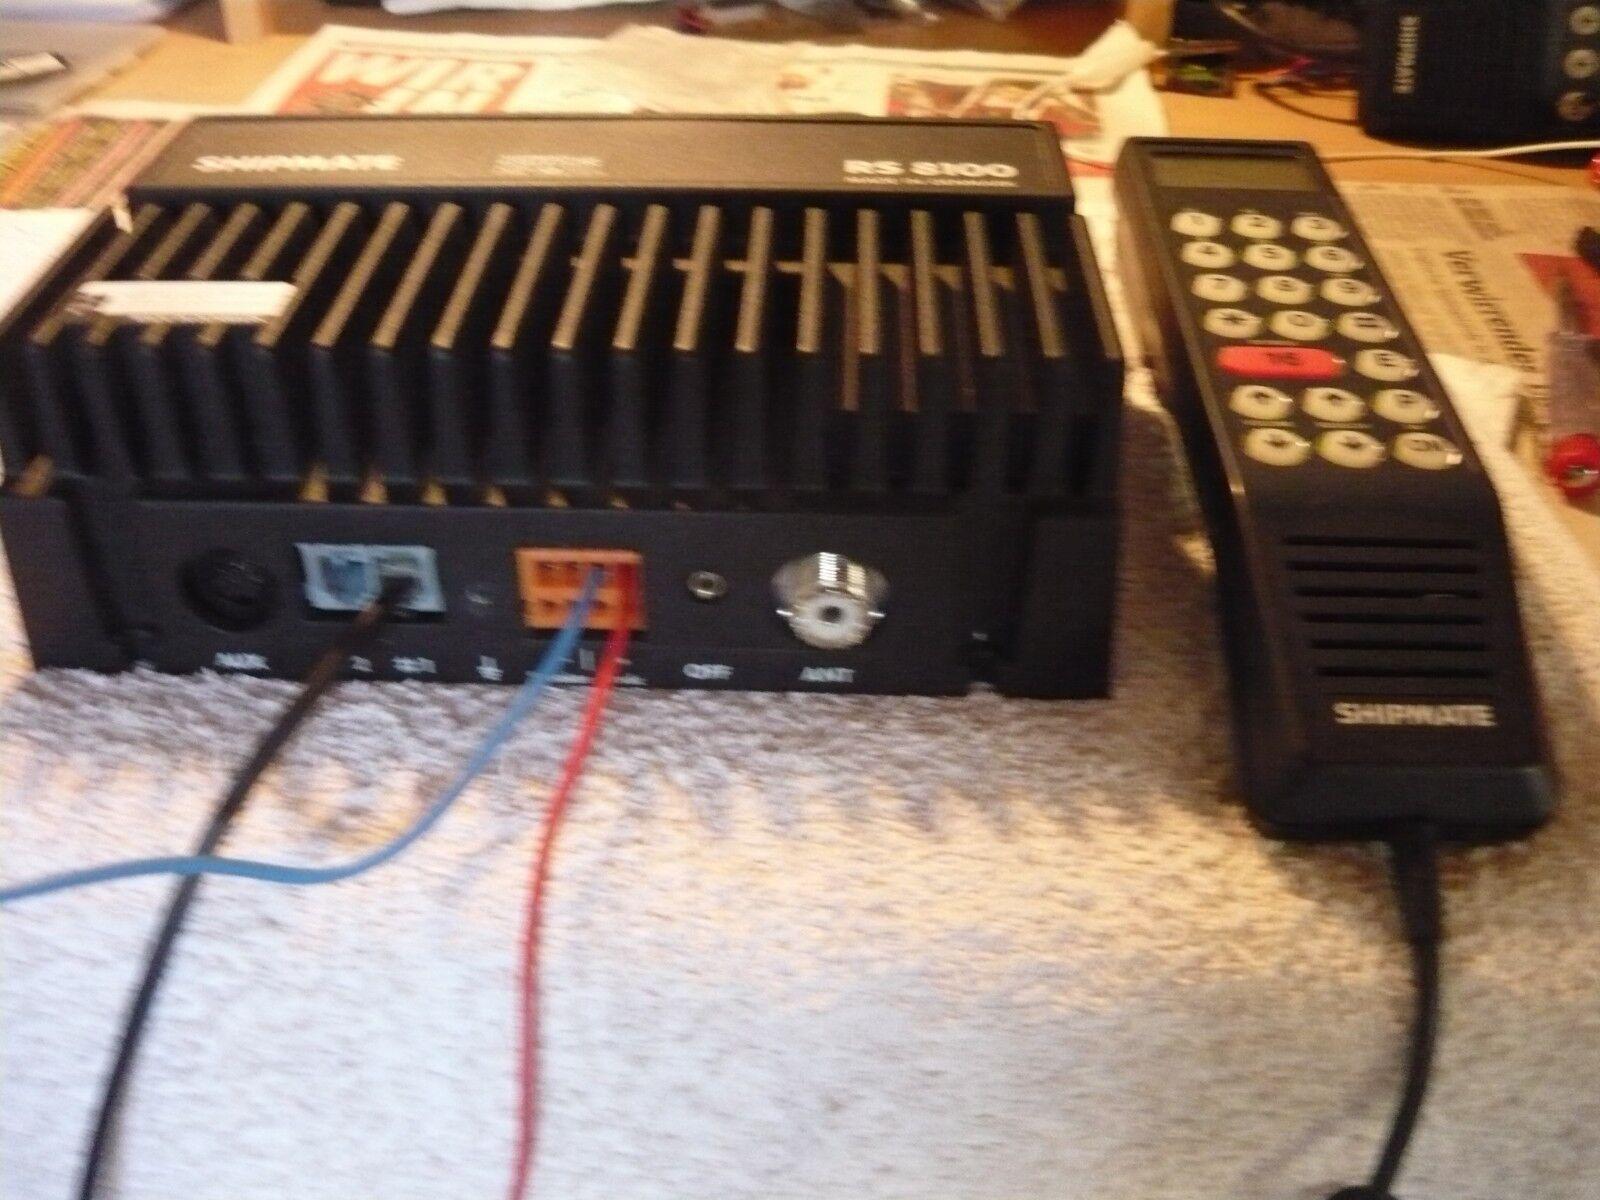 Shipmate RS 8100, Funkgerät VHF, Funkgerät 8100, 8072d6